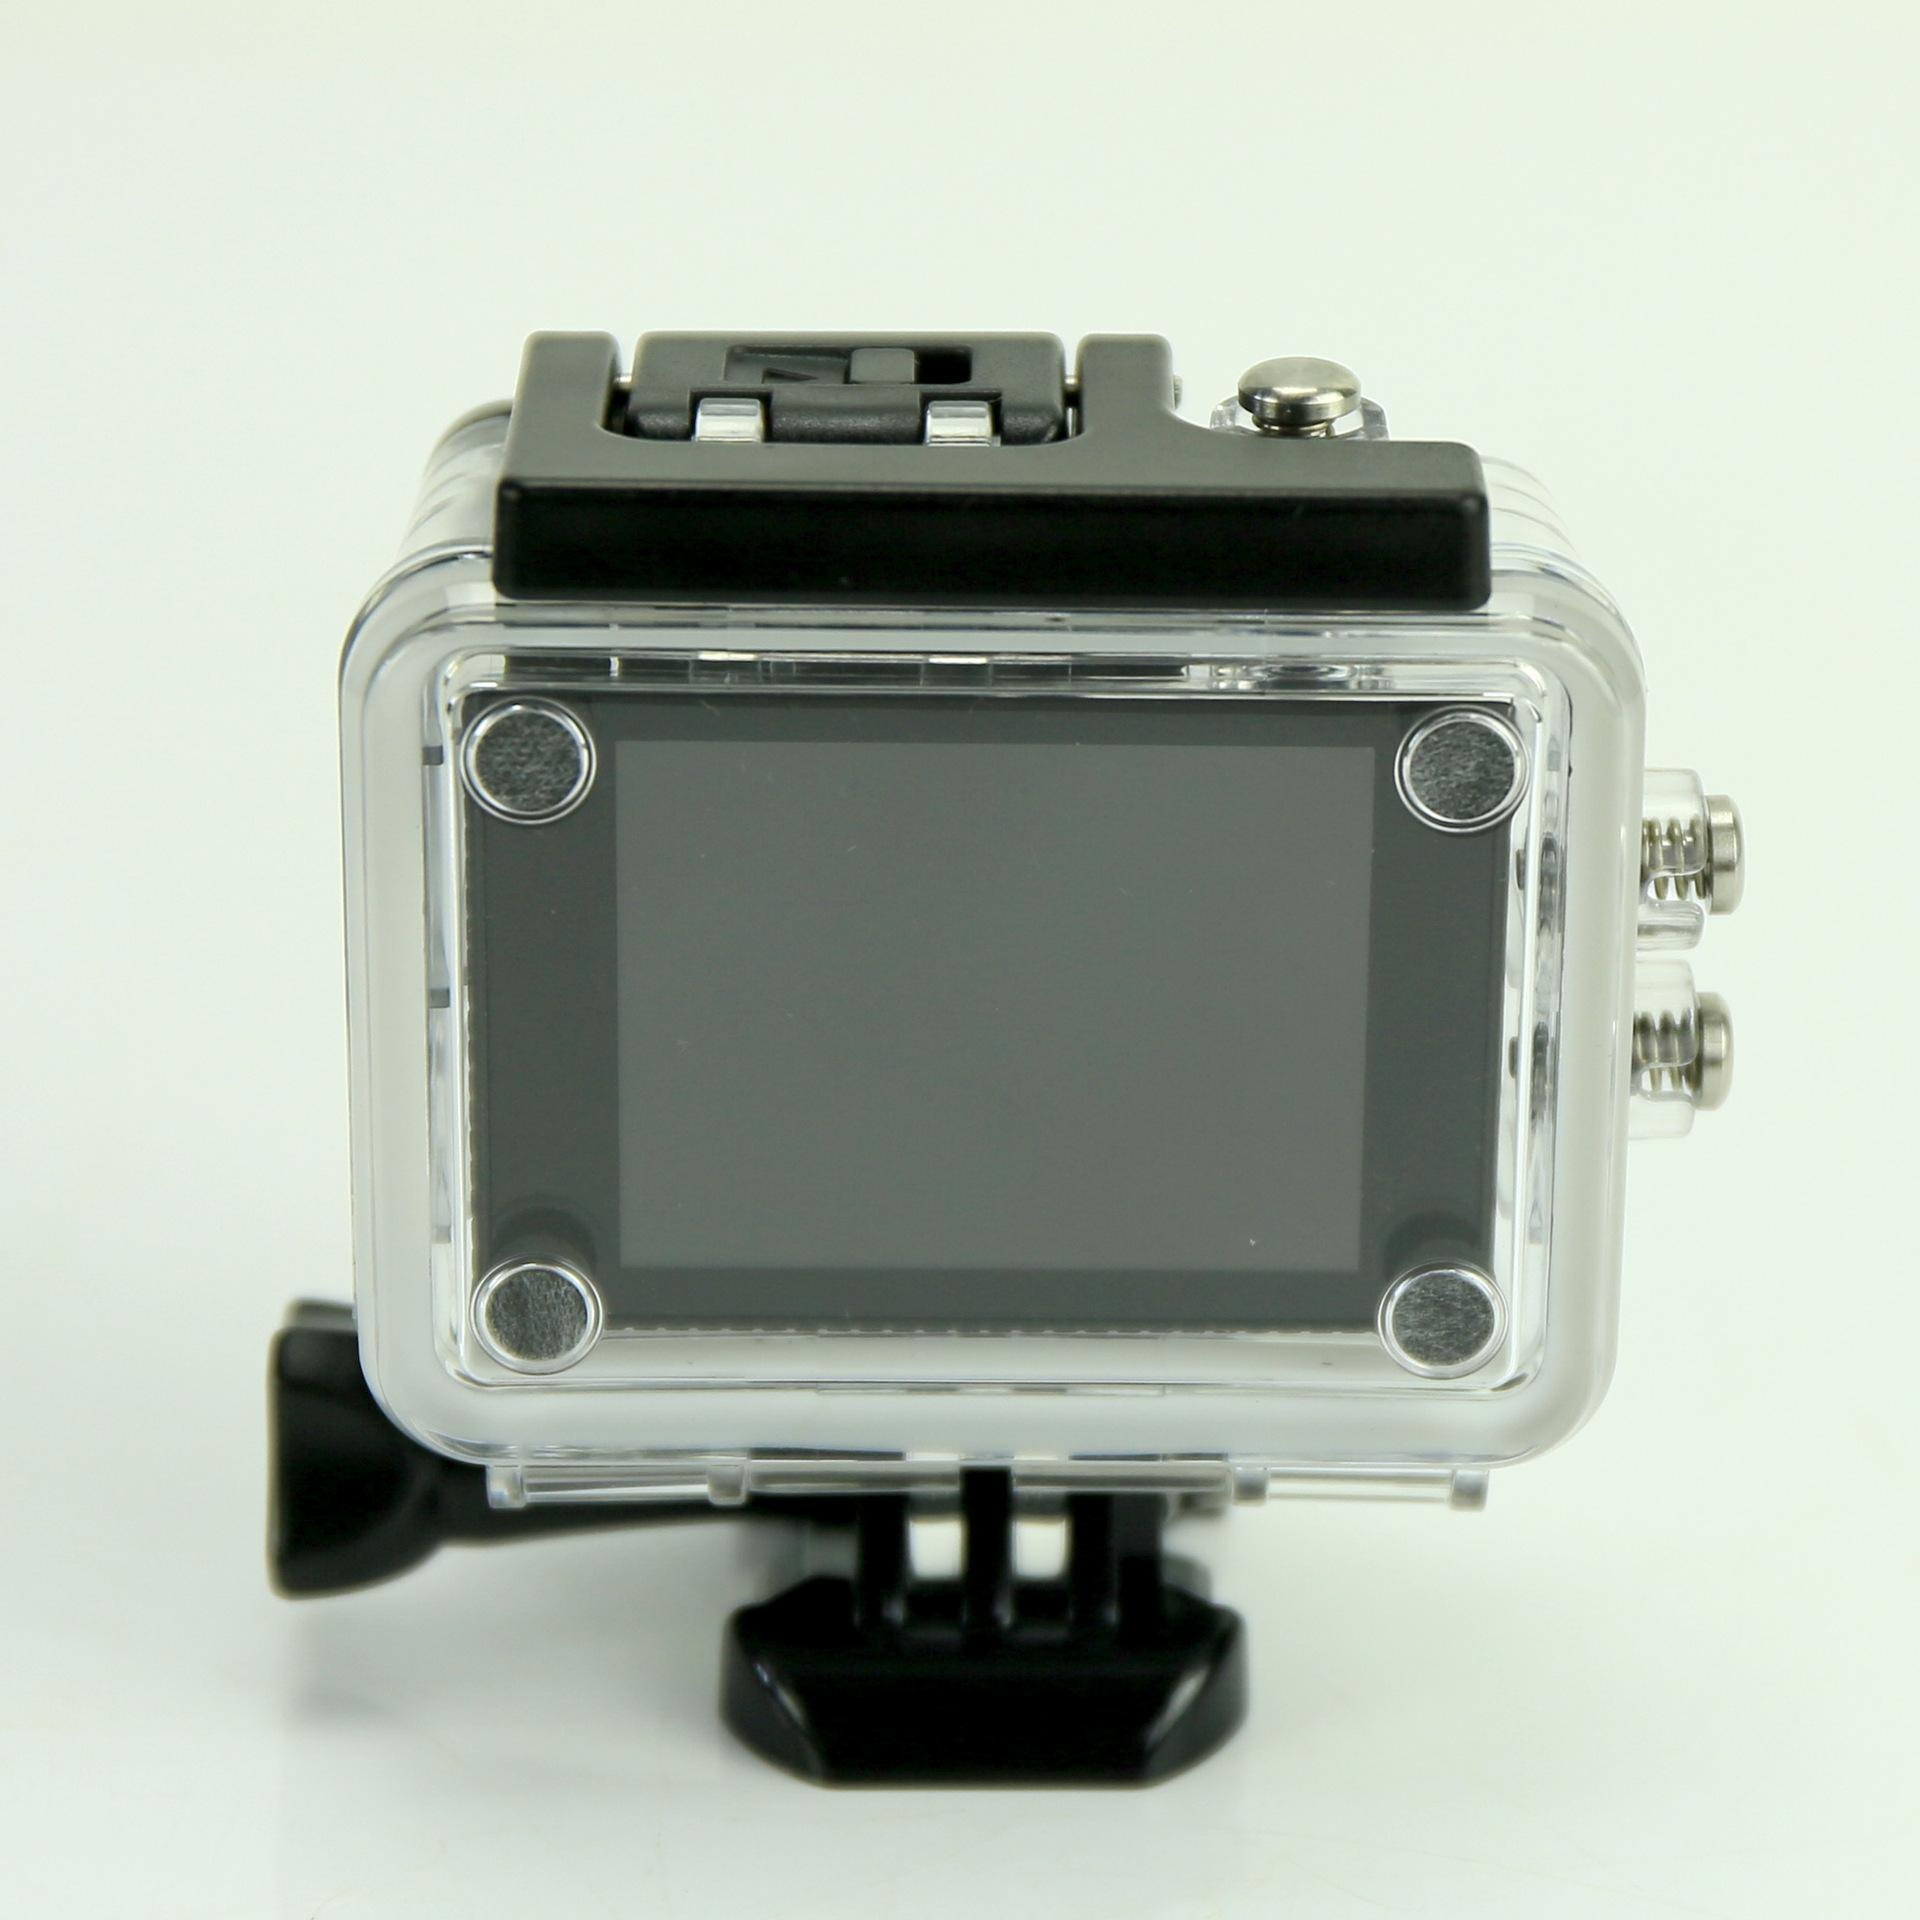 Action Camera Ultra HD 4K 30fps WiFi 2.0-inch 170D Underwater Waterproof Helmet 1